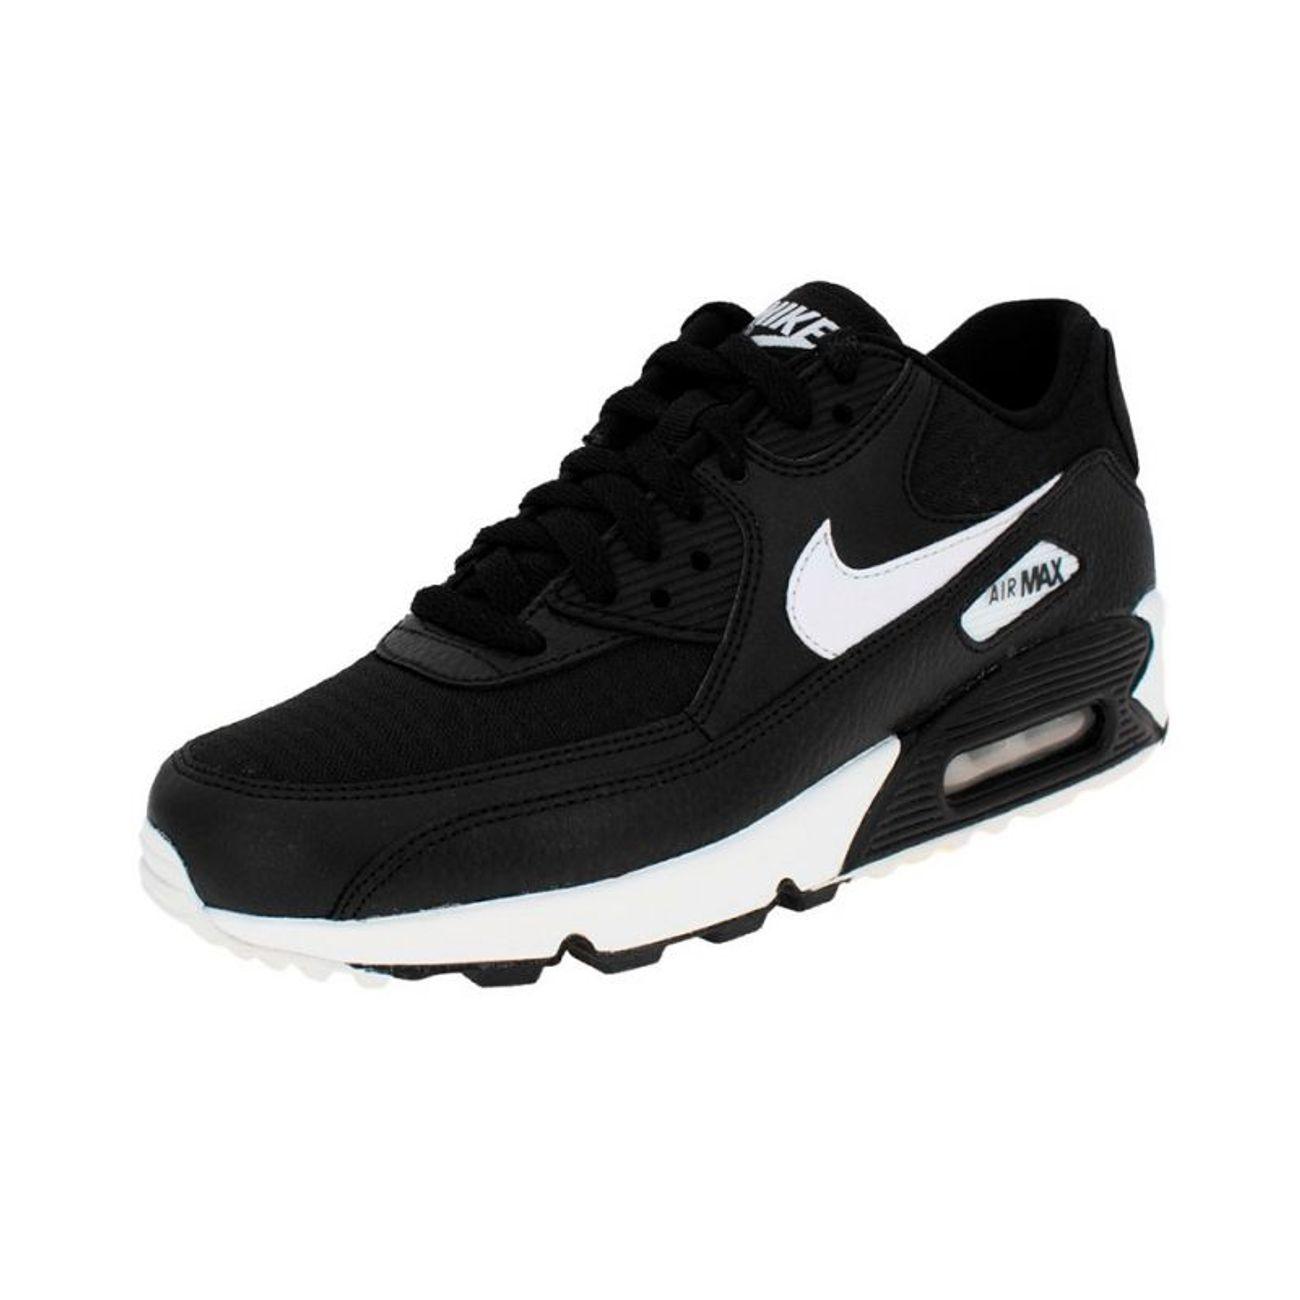 Adulte Nike 90 Femme Padel Max Noir Air P0wkn8O